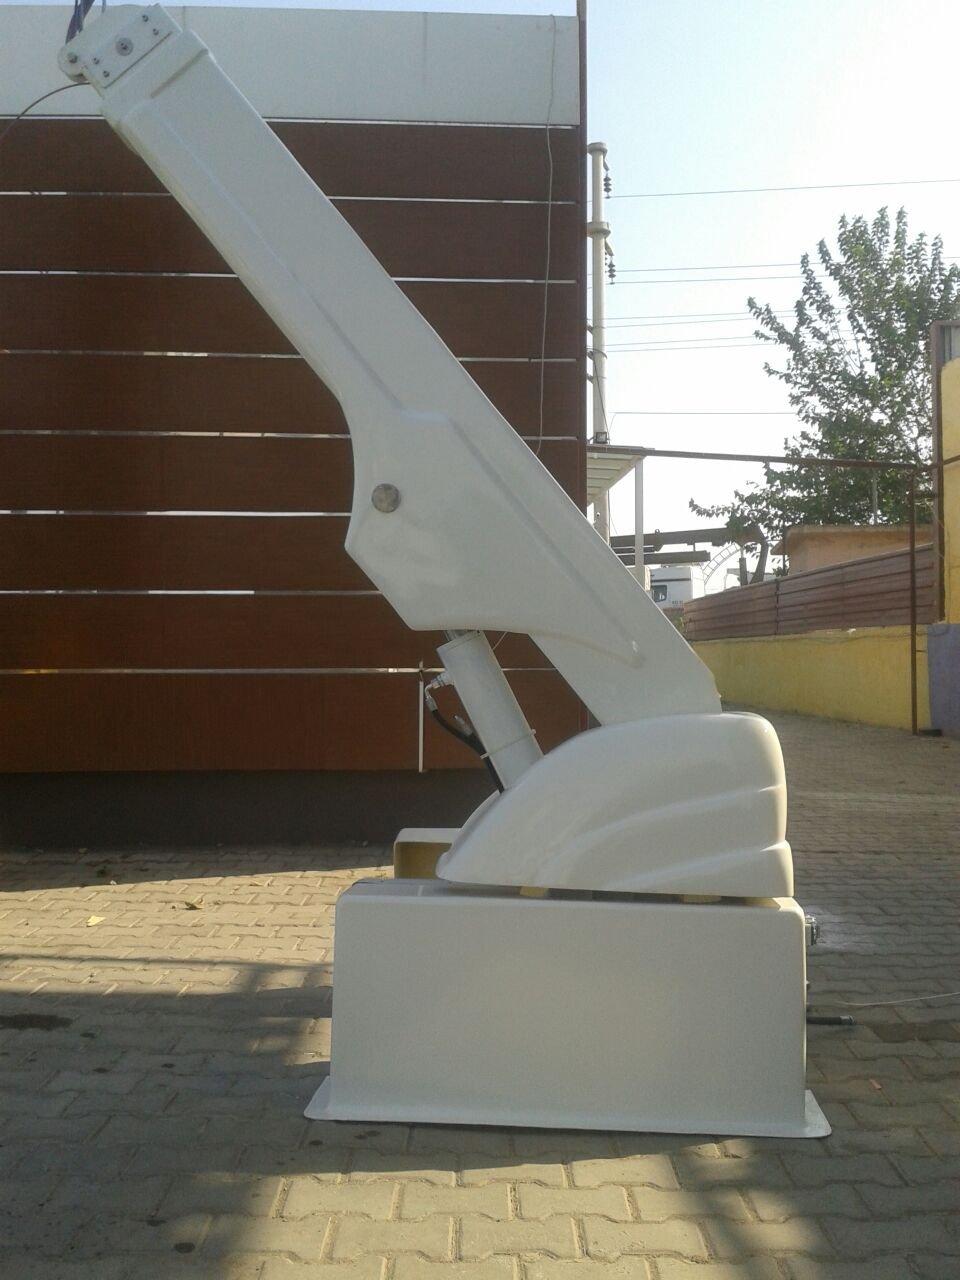 puma-marine-crane530098.jpg